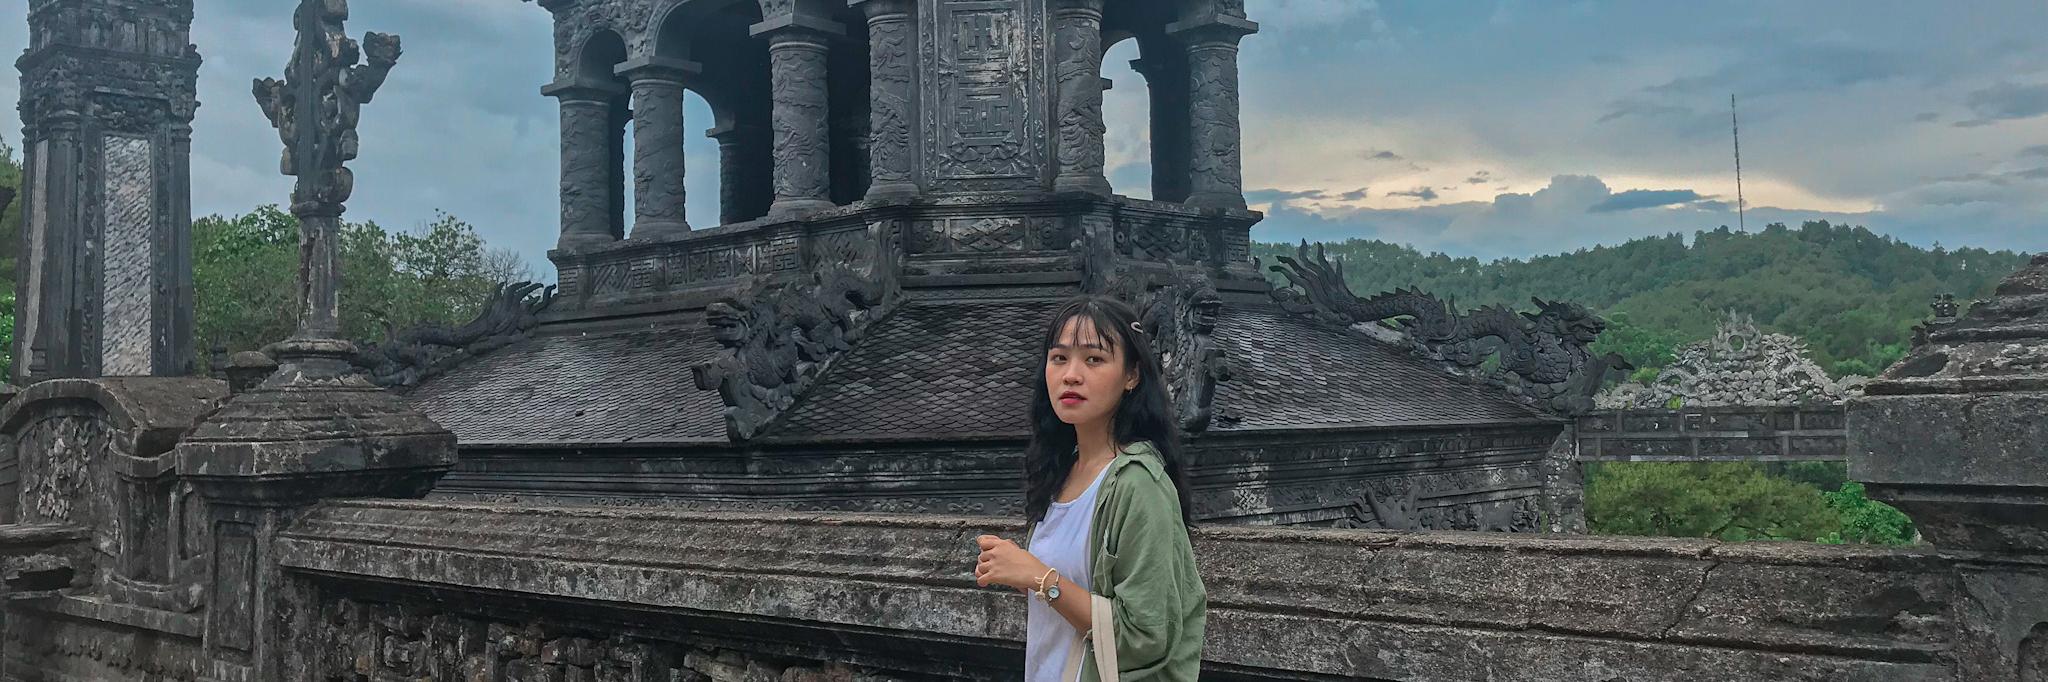 https://gody.vn/blog/kieudiem01633302/post/lang-khai-dinh-ung-lang-hue-7720